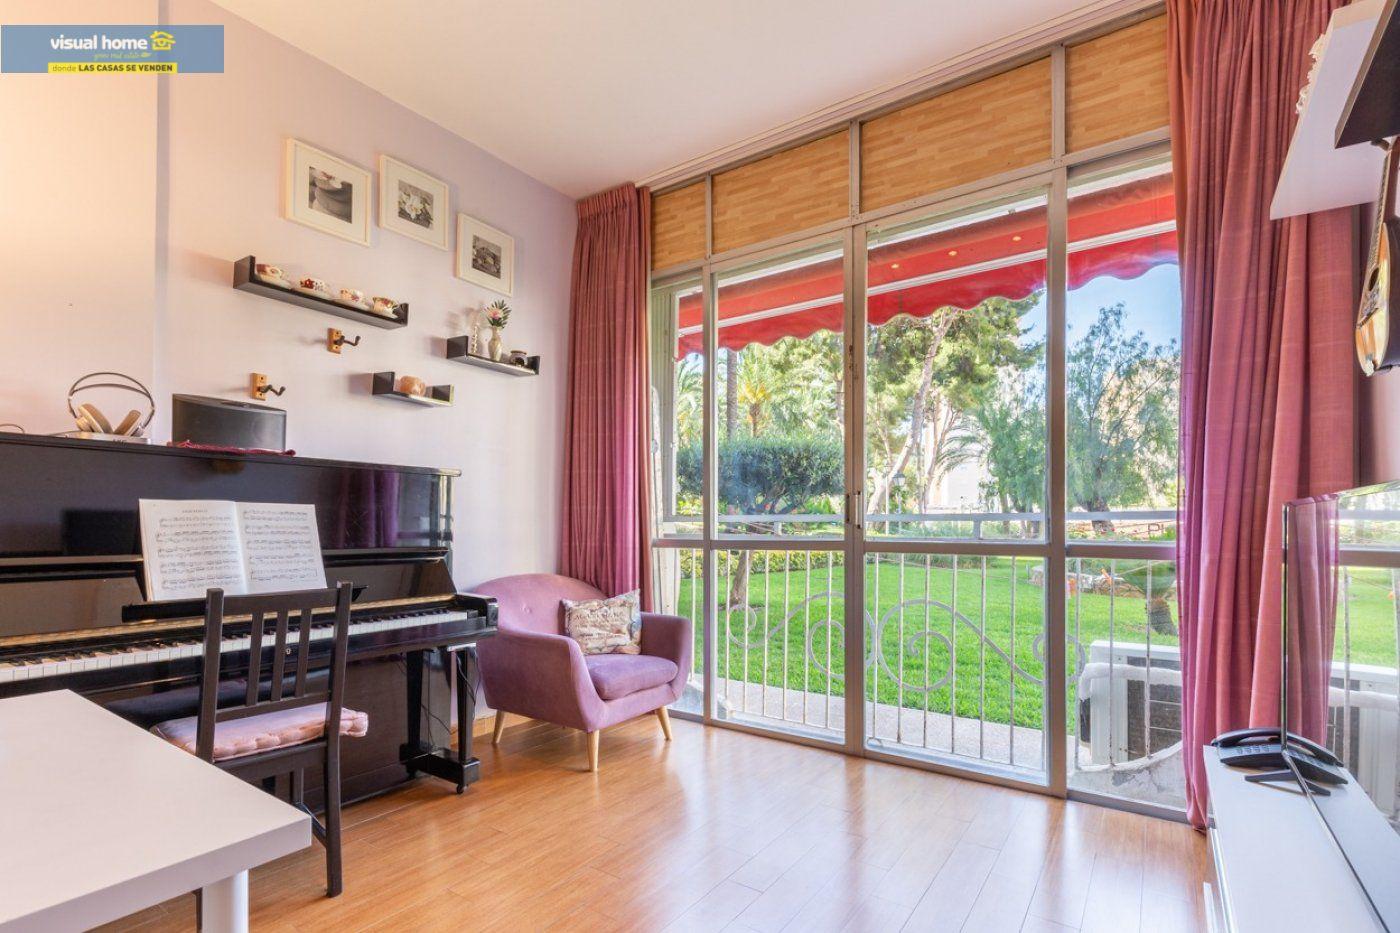 Estudio en Benidorm zona Rincon de Loix de 35 m²